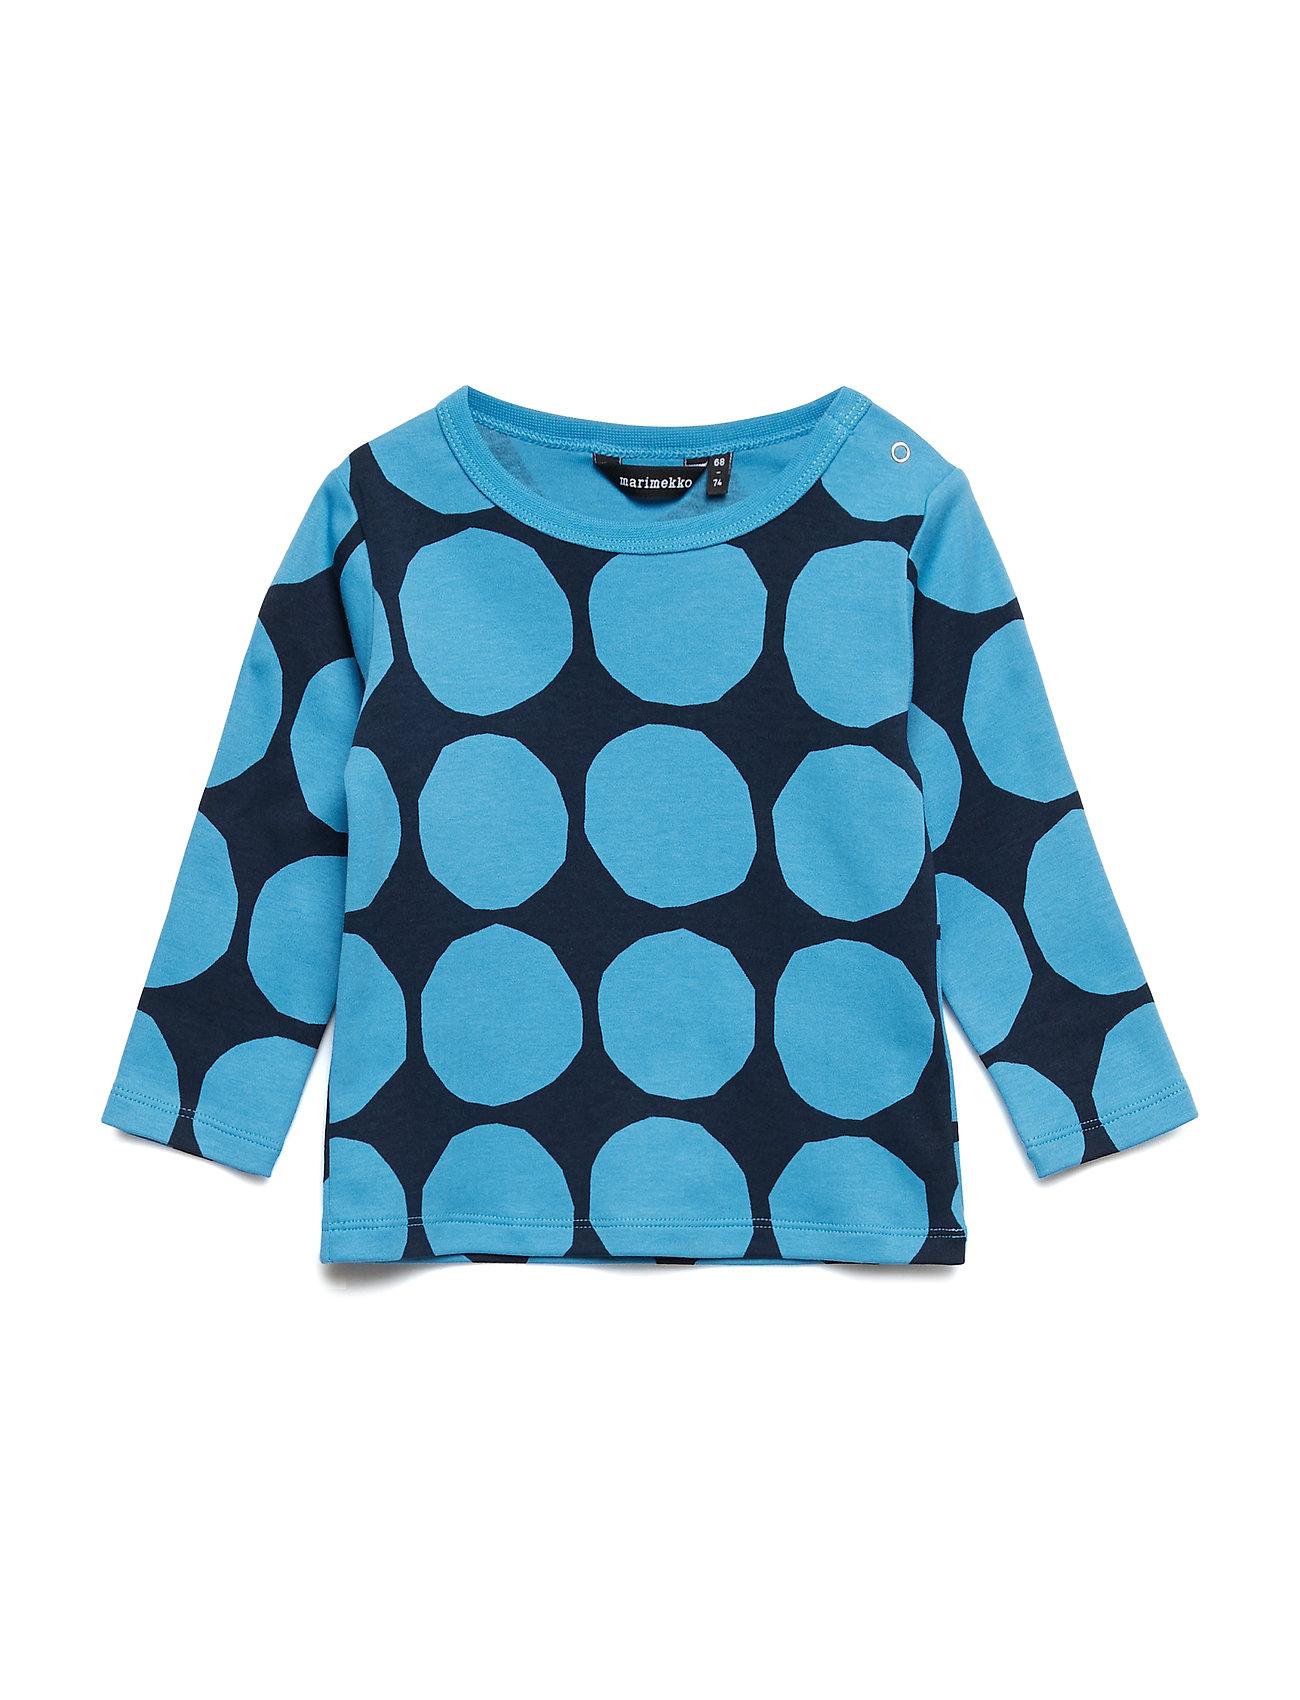 Marimekko RUUPERTTI MINI KIVET 1 Shirt - BRIGHT BLUE, DARK BLUE